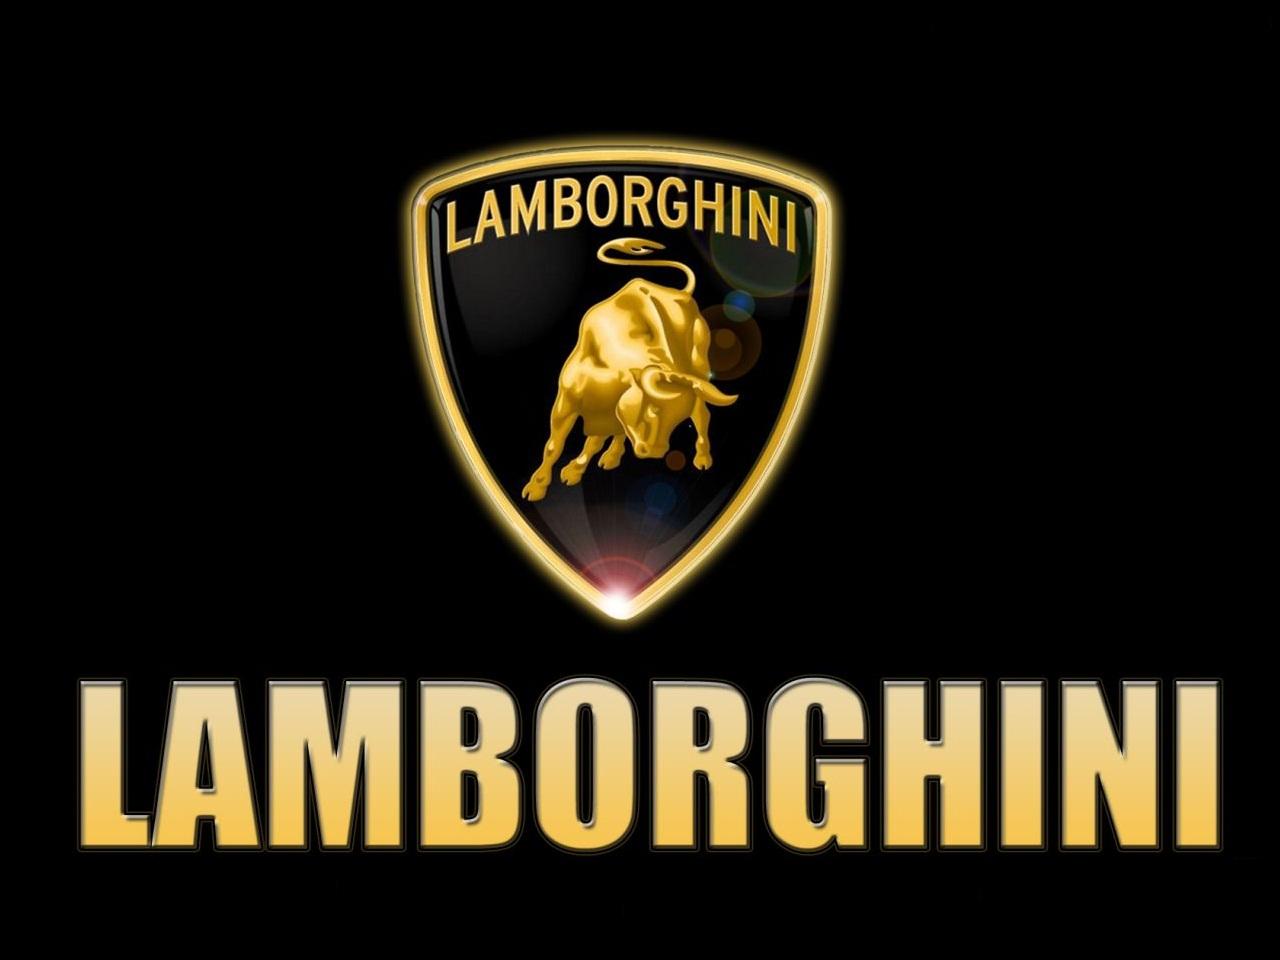 Lamborghini Old Logos